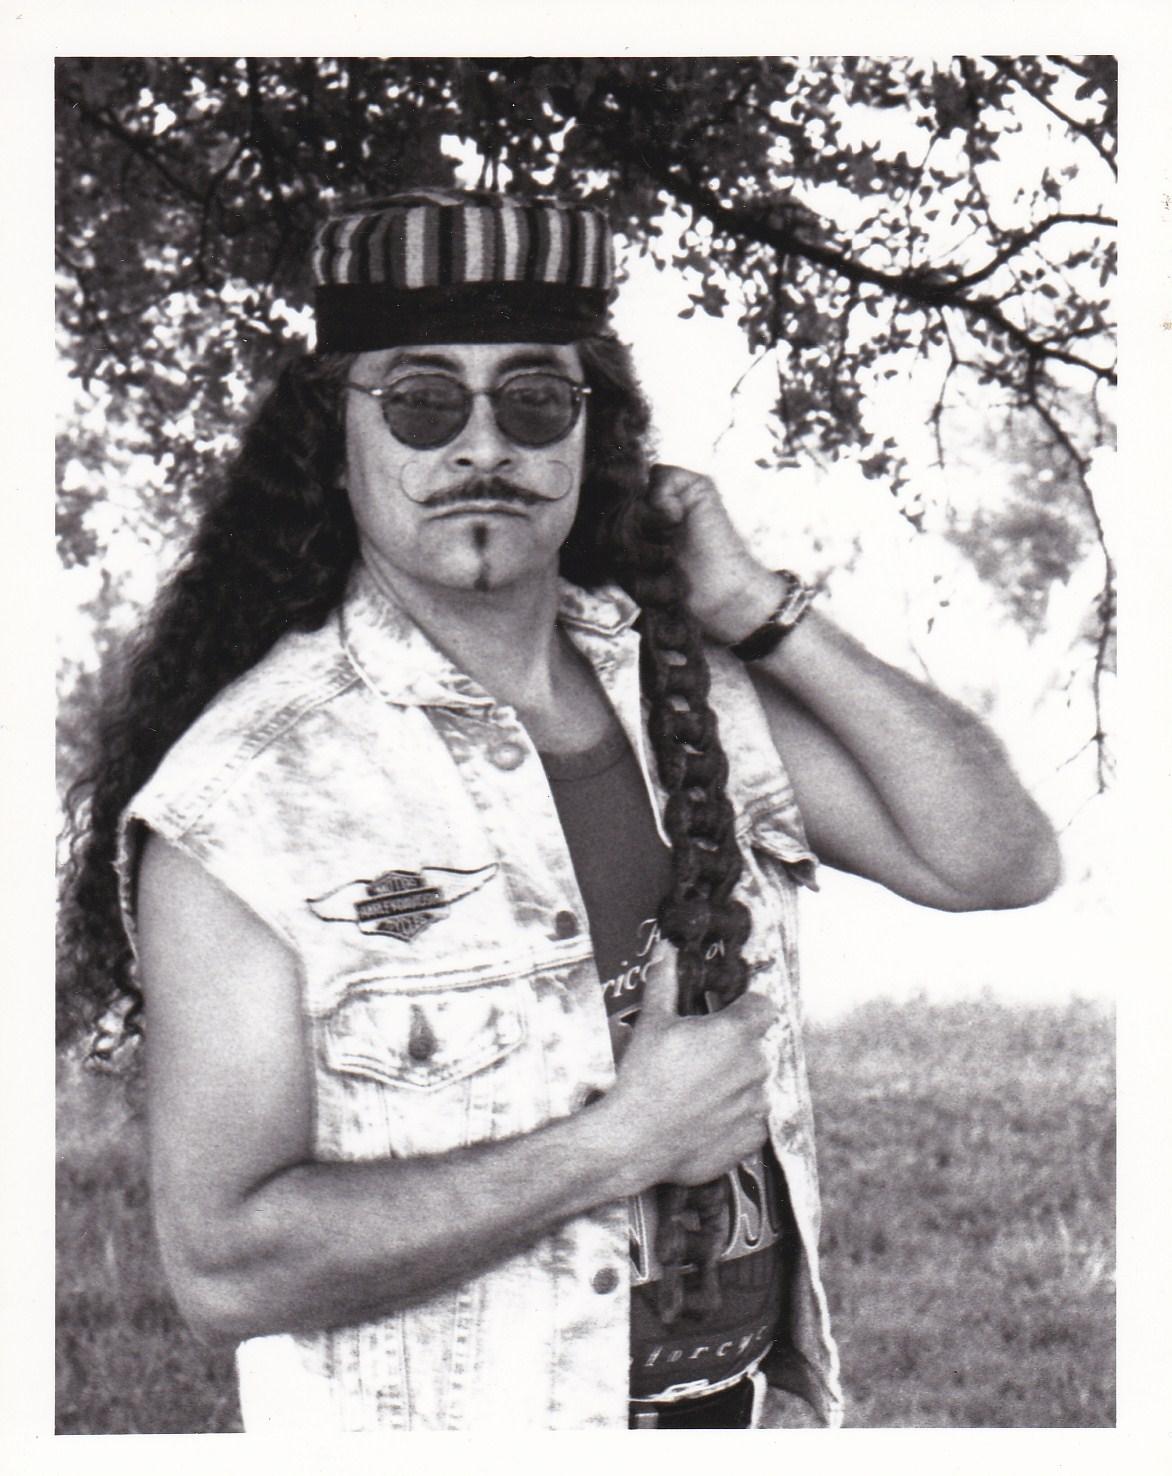 1984 Joseph with chain.jpg